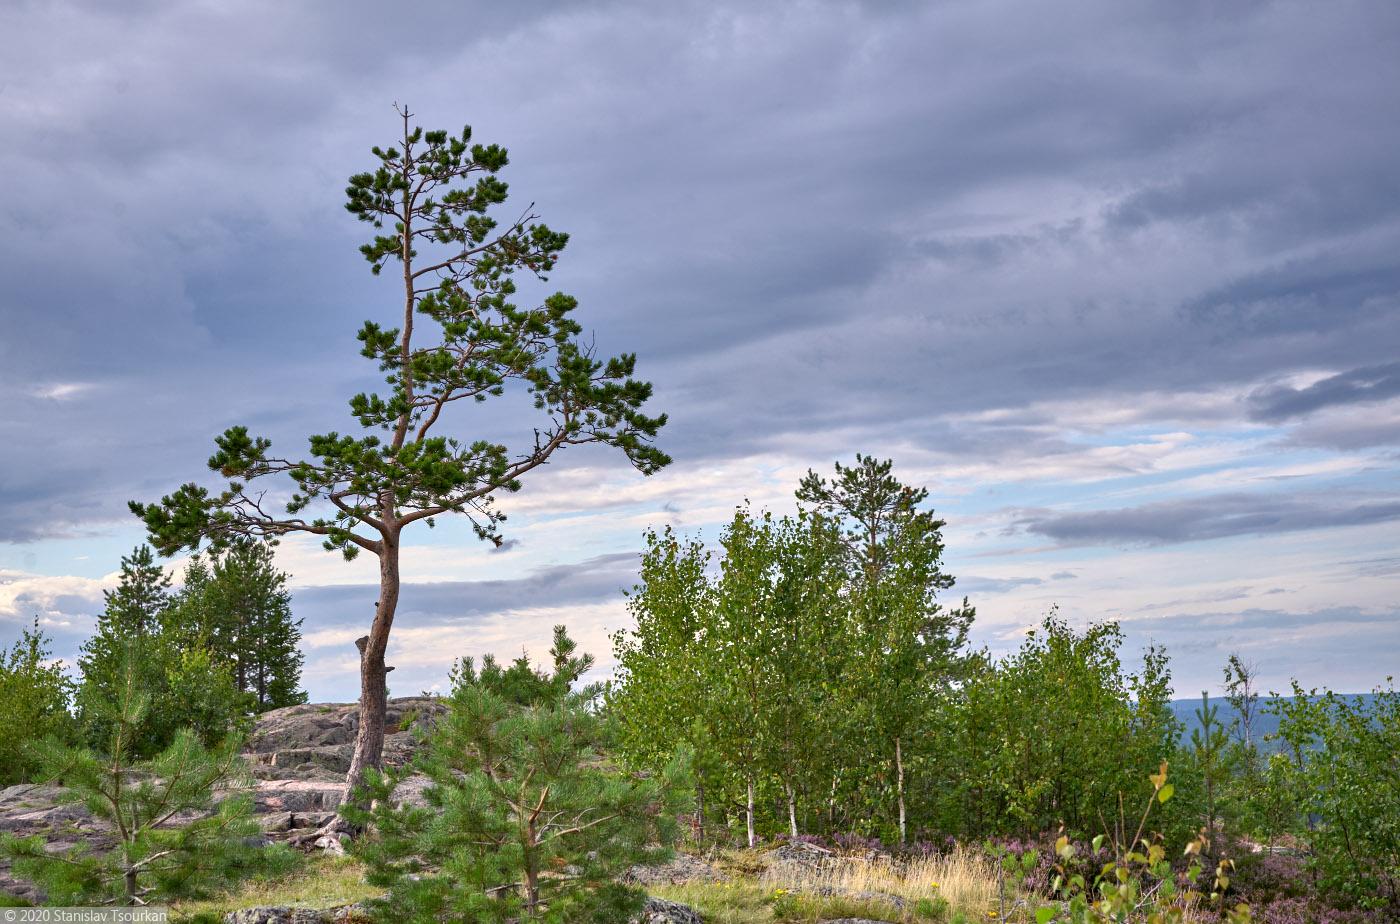 Карелия, республика Карелия, гора, Хийденвуори, пейзажи, природа, сосна